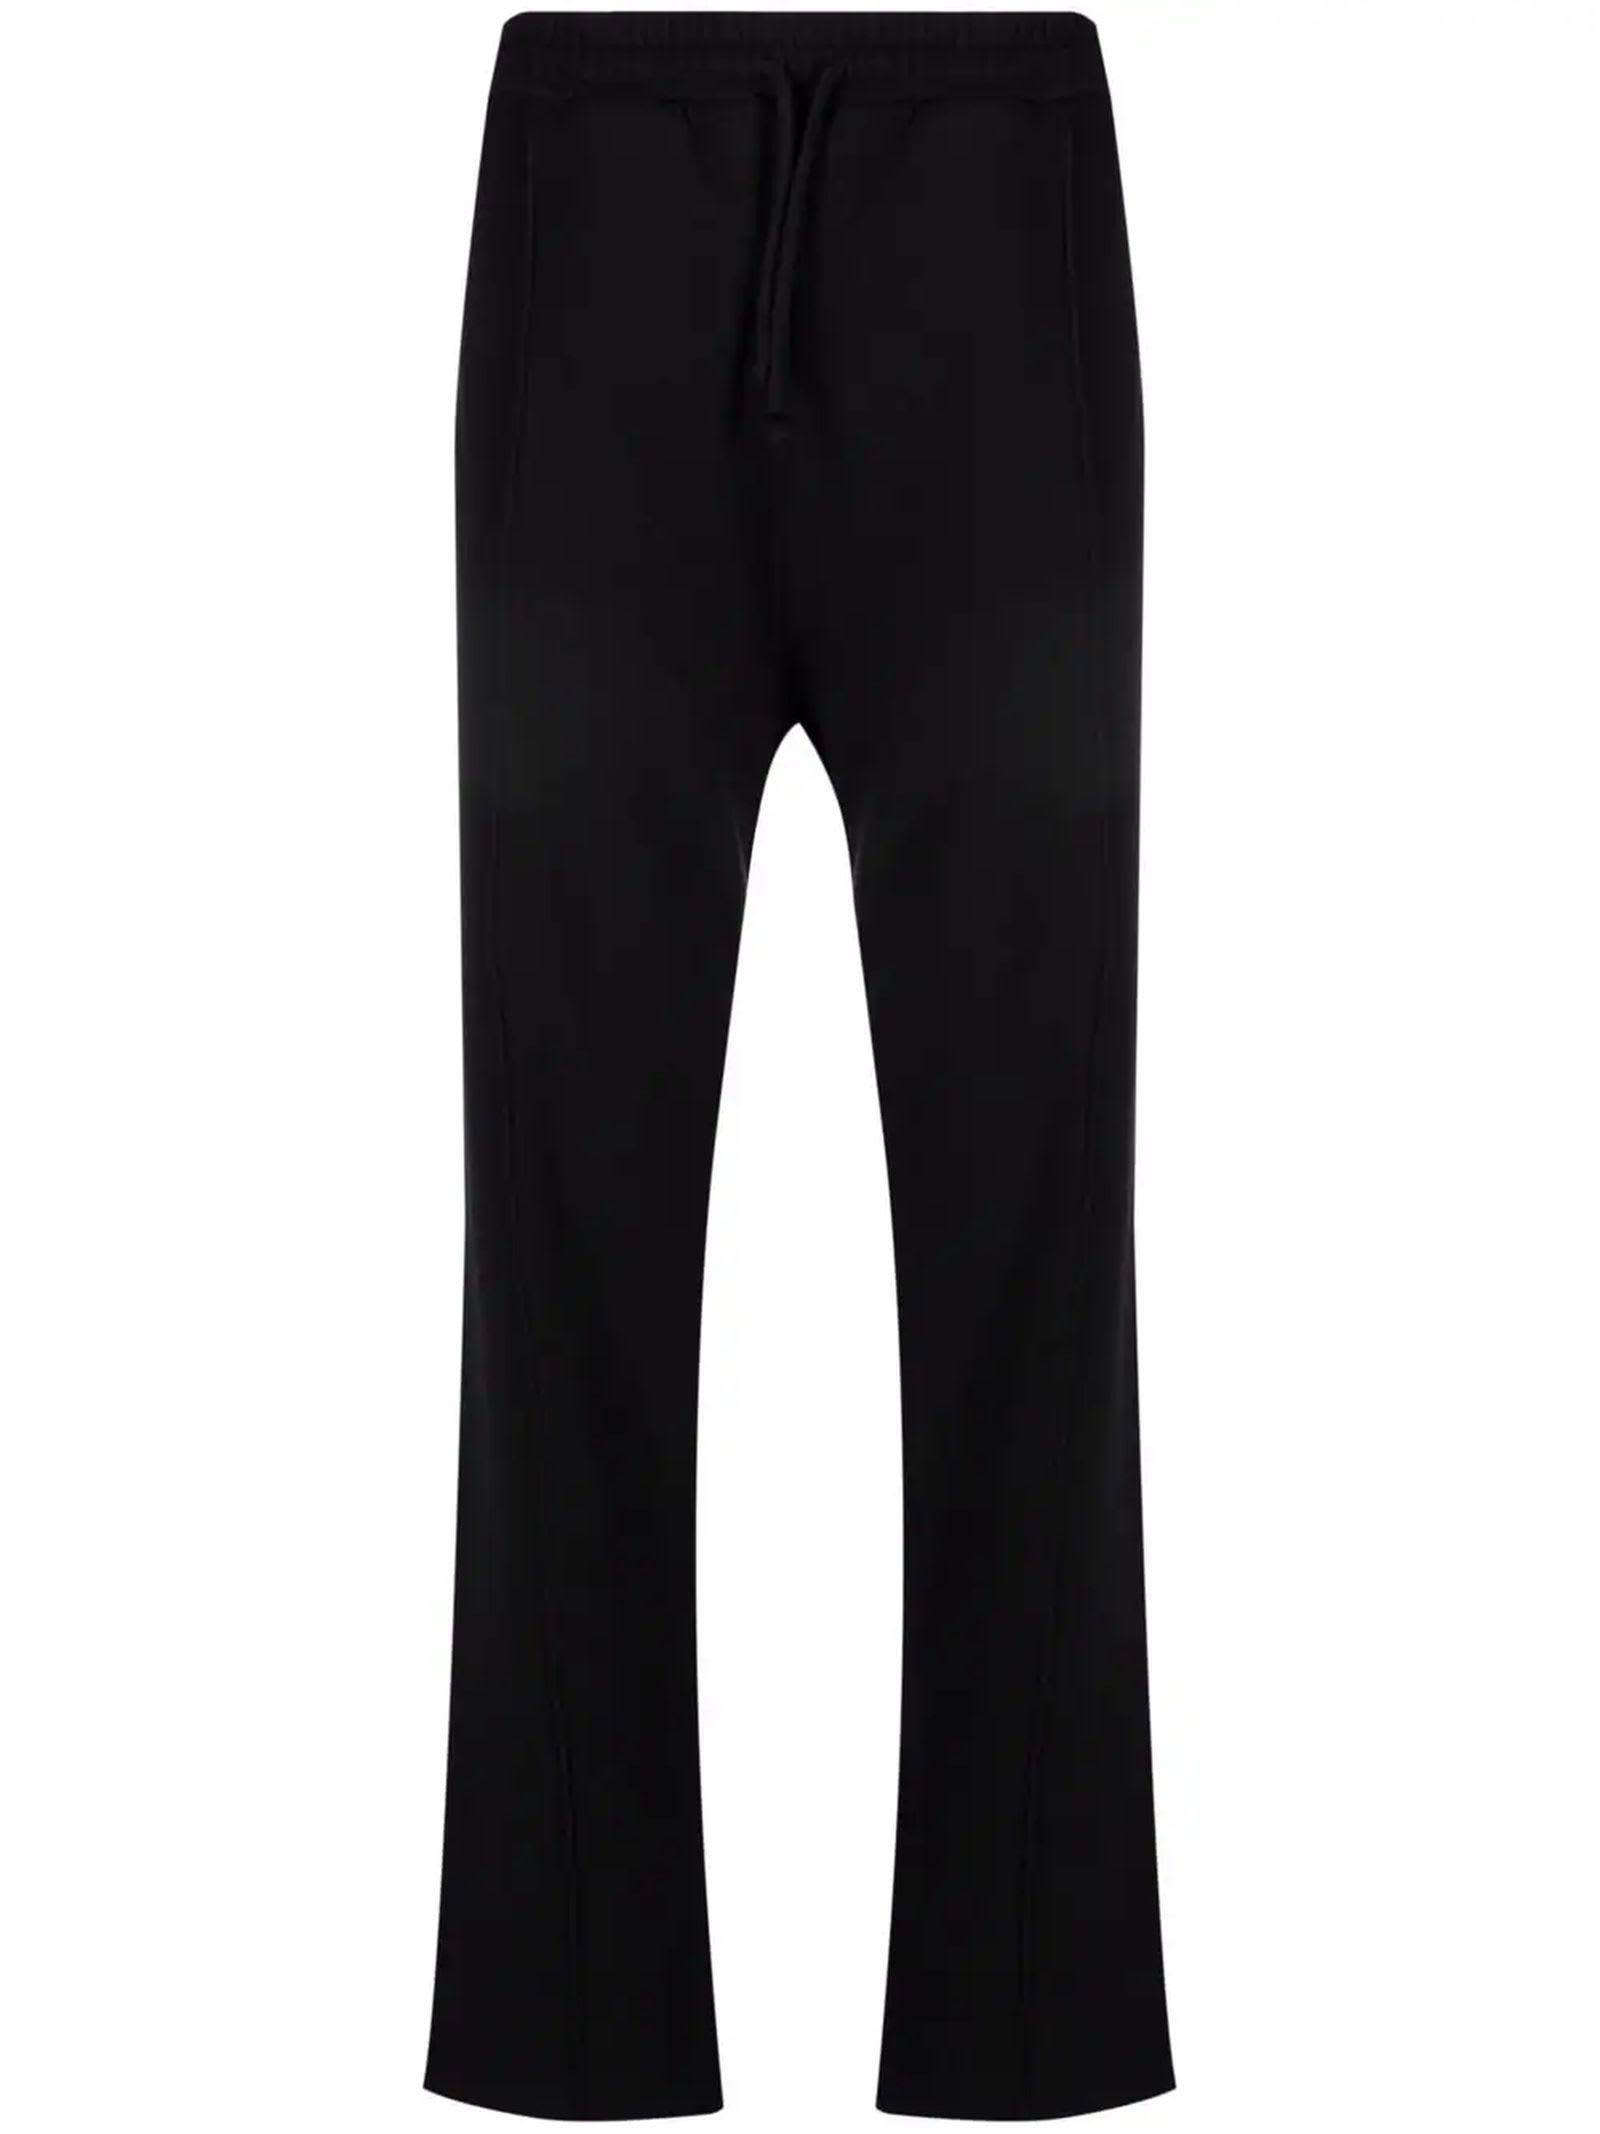 Black Cotton Track Trousers